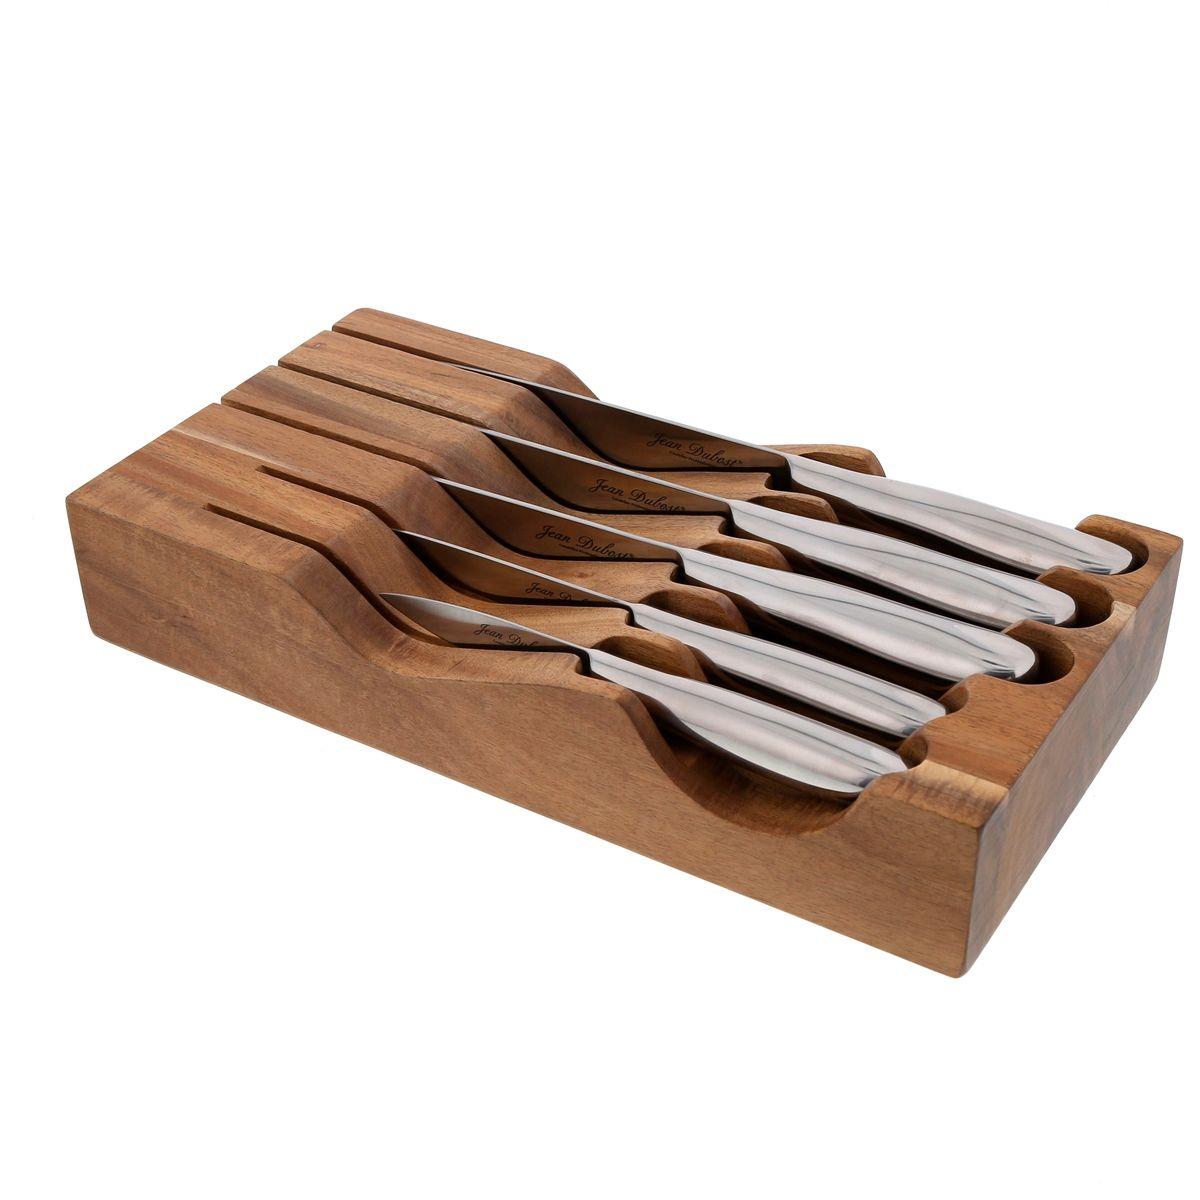 Bloc horizontal 5 couteaux tout inox - Jean Dubost